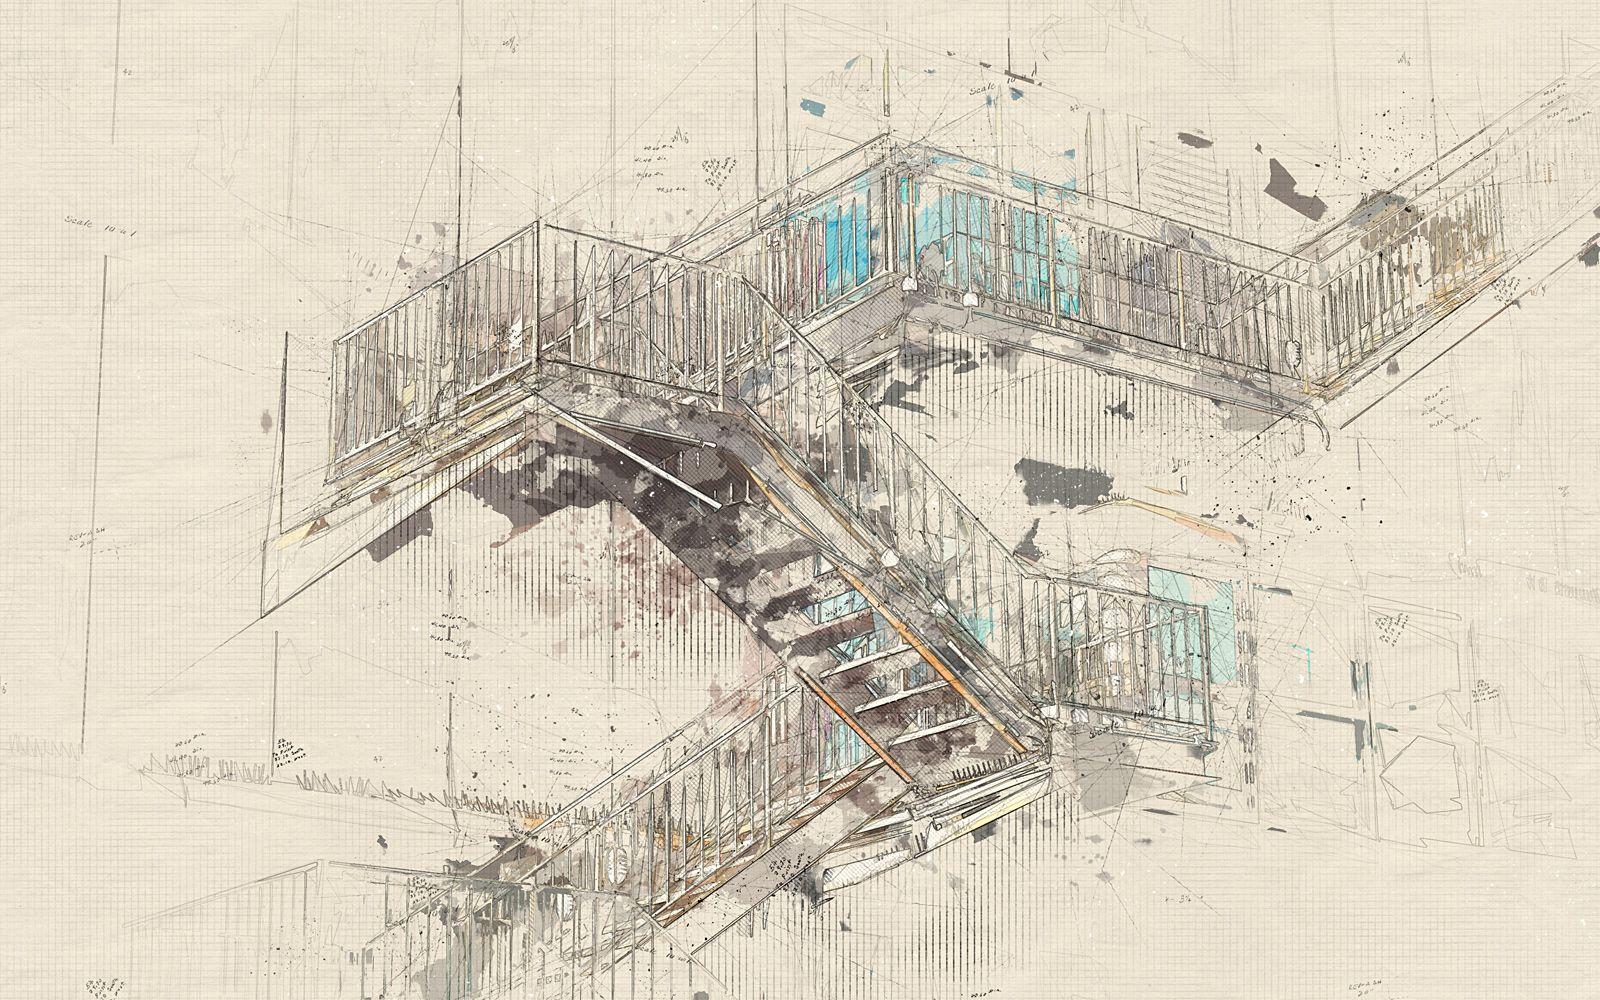 Architecture Sketch Tools Architectum 2 Photoshop Action Aff